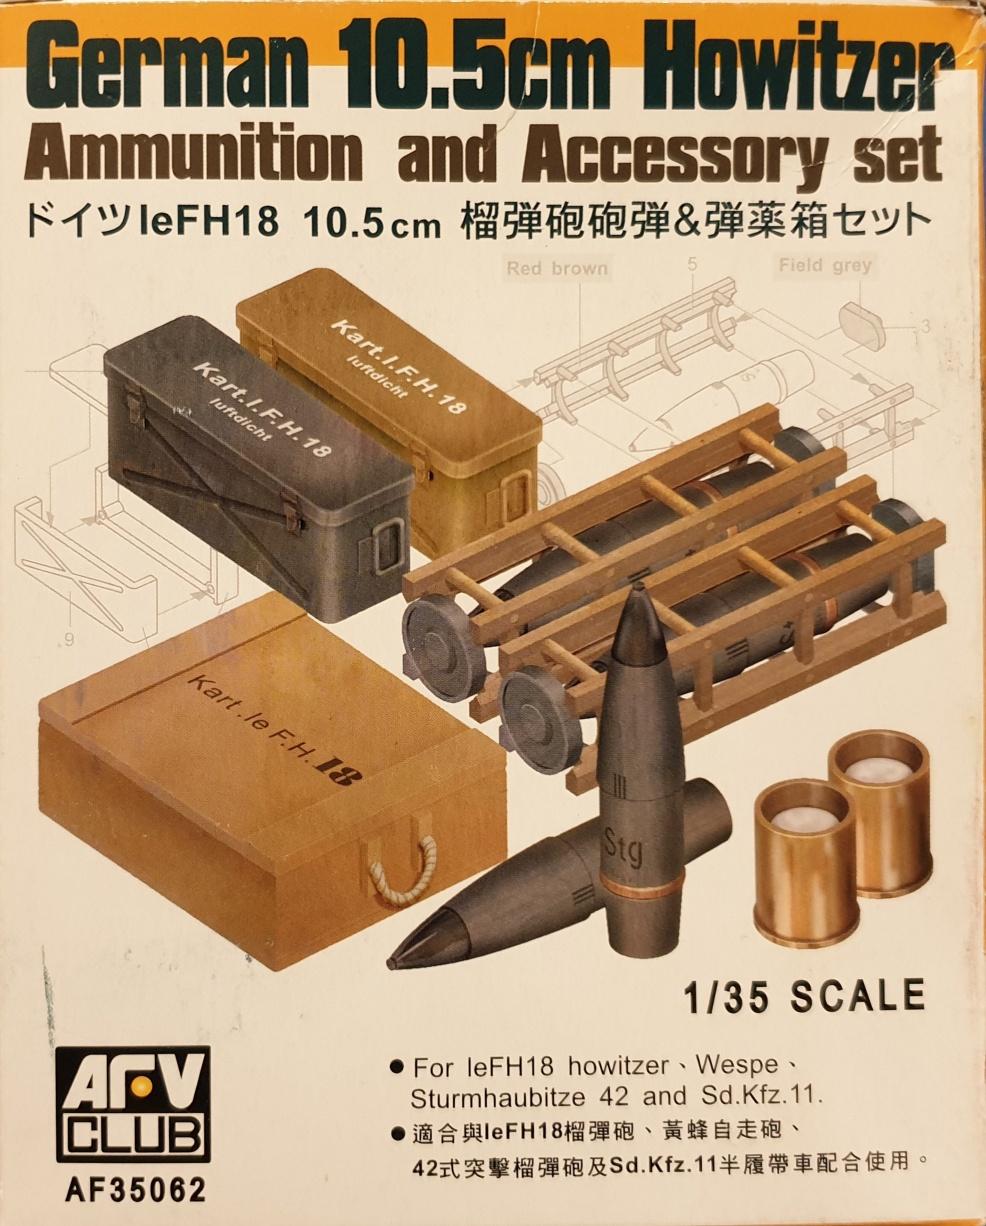 AFV Club AF 35062 German 10.5cm Howitzer Ammunition and Accessory set